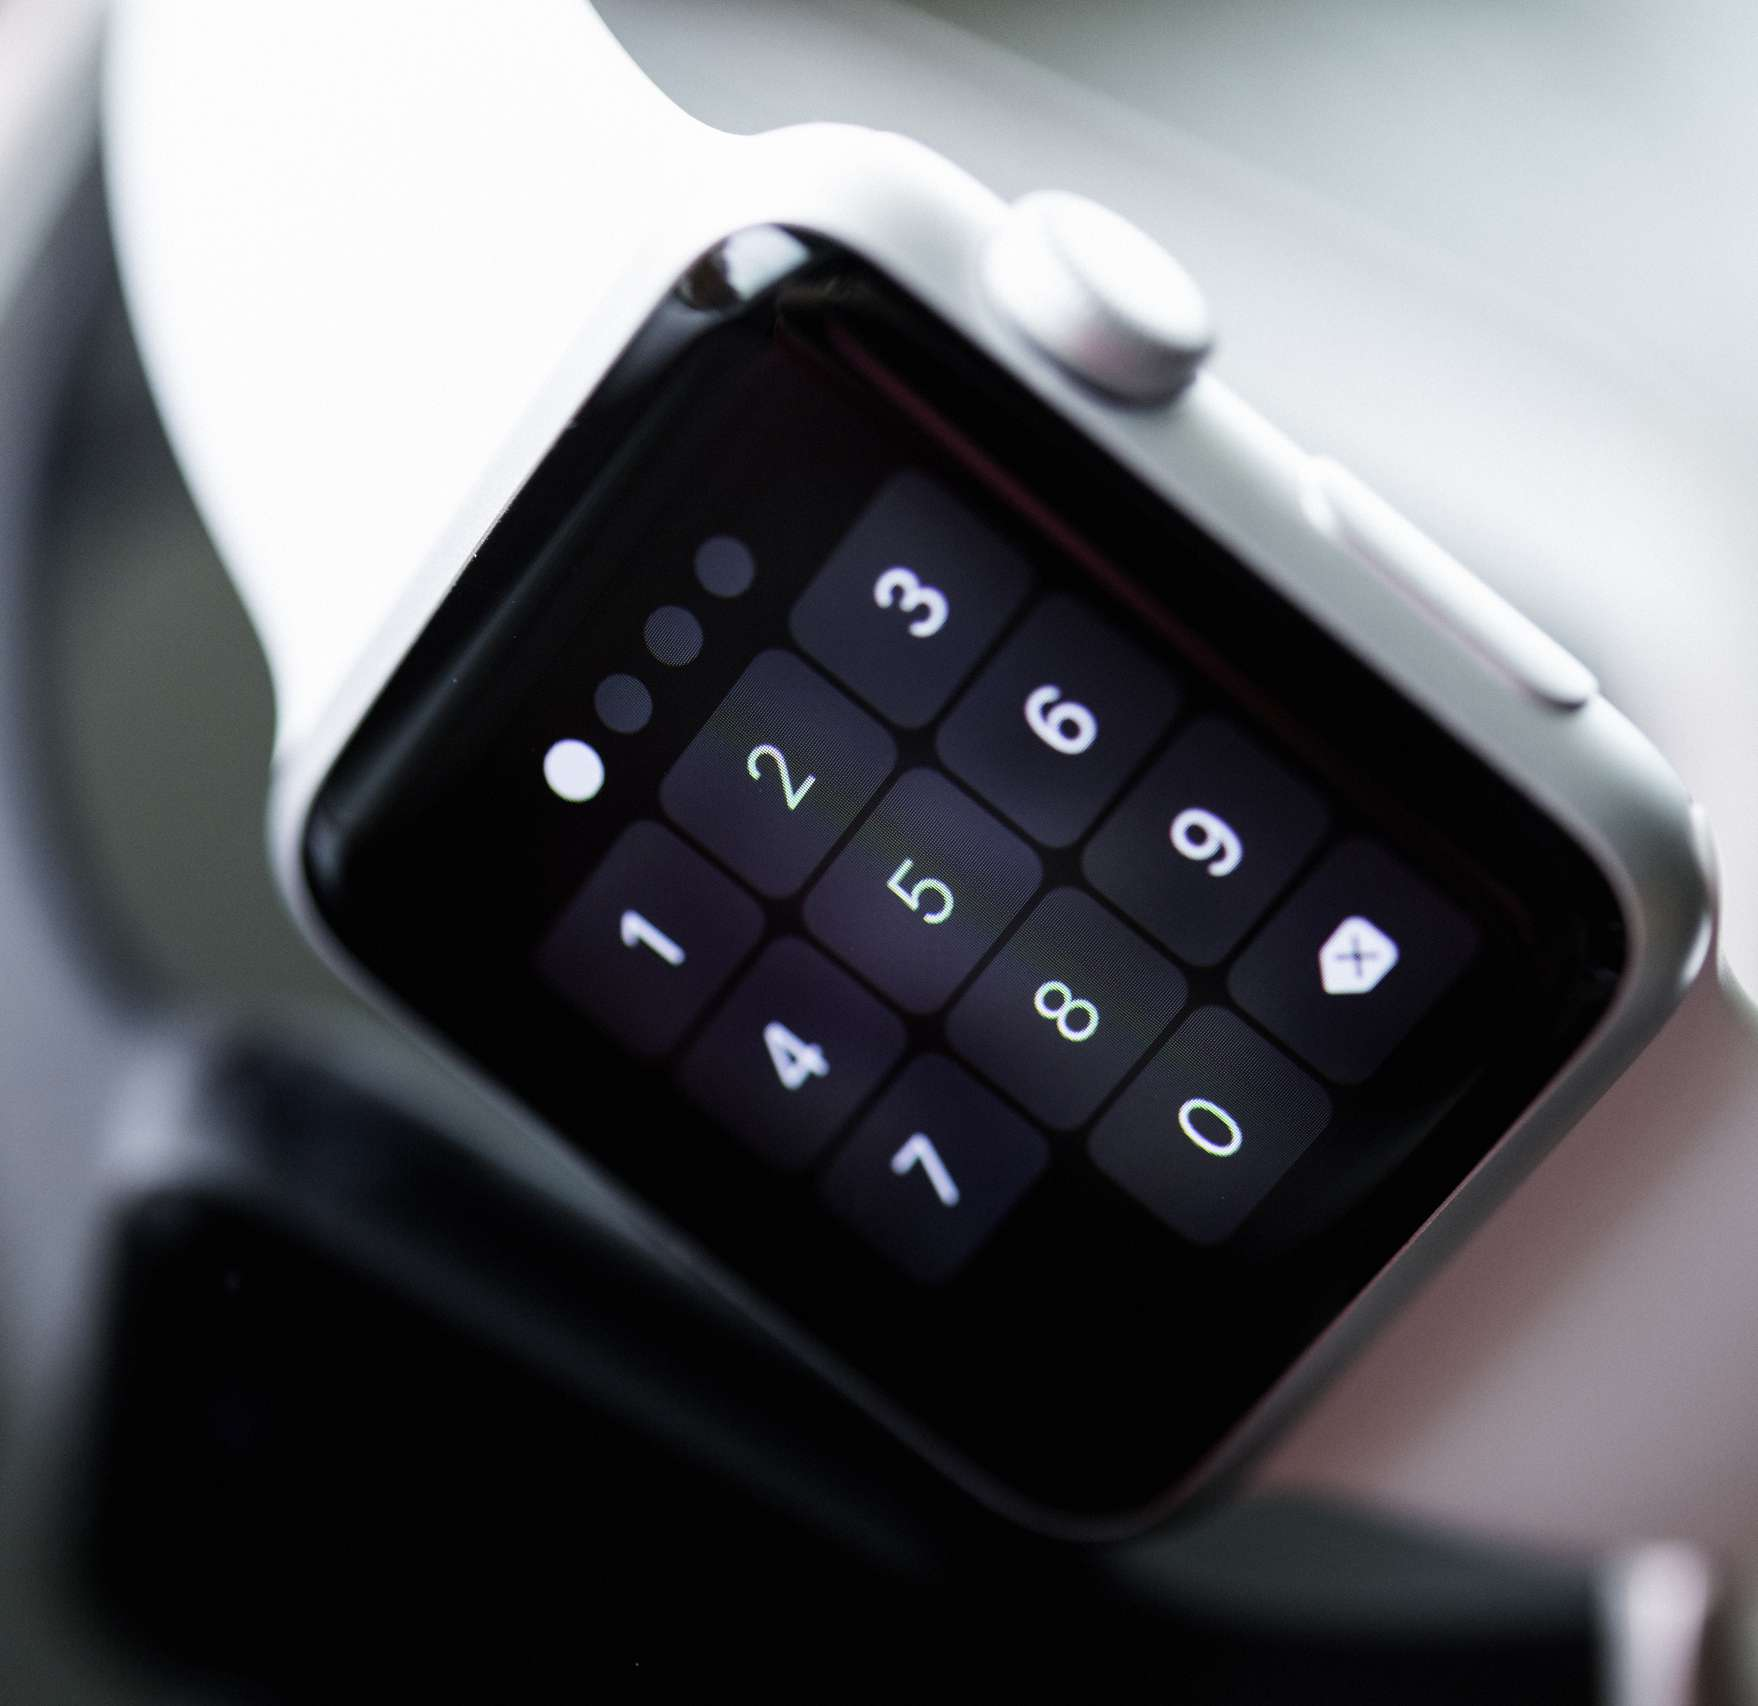 Apple watch face showing passcode screen